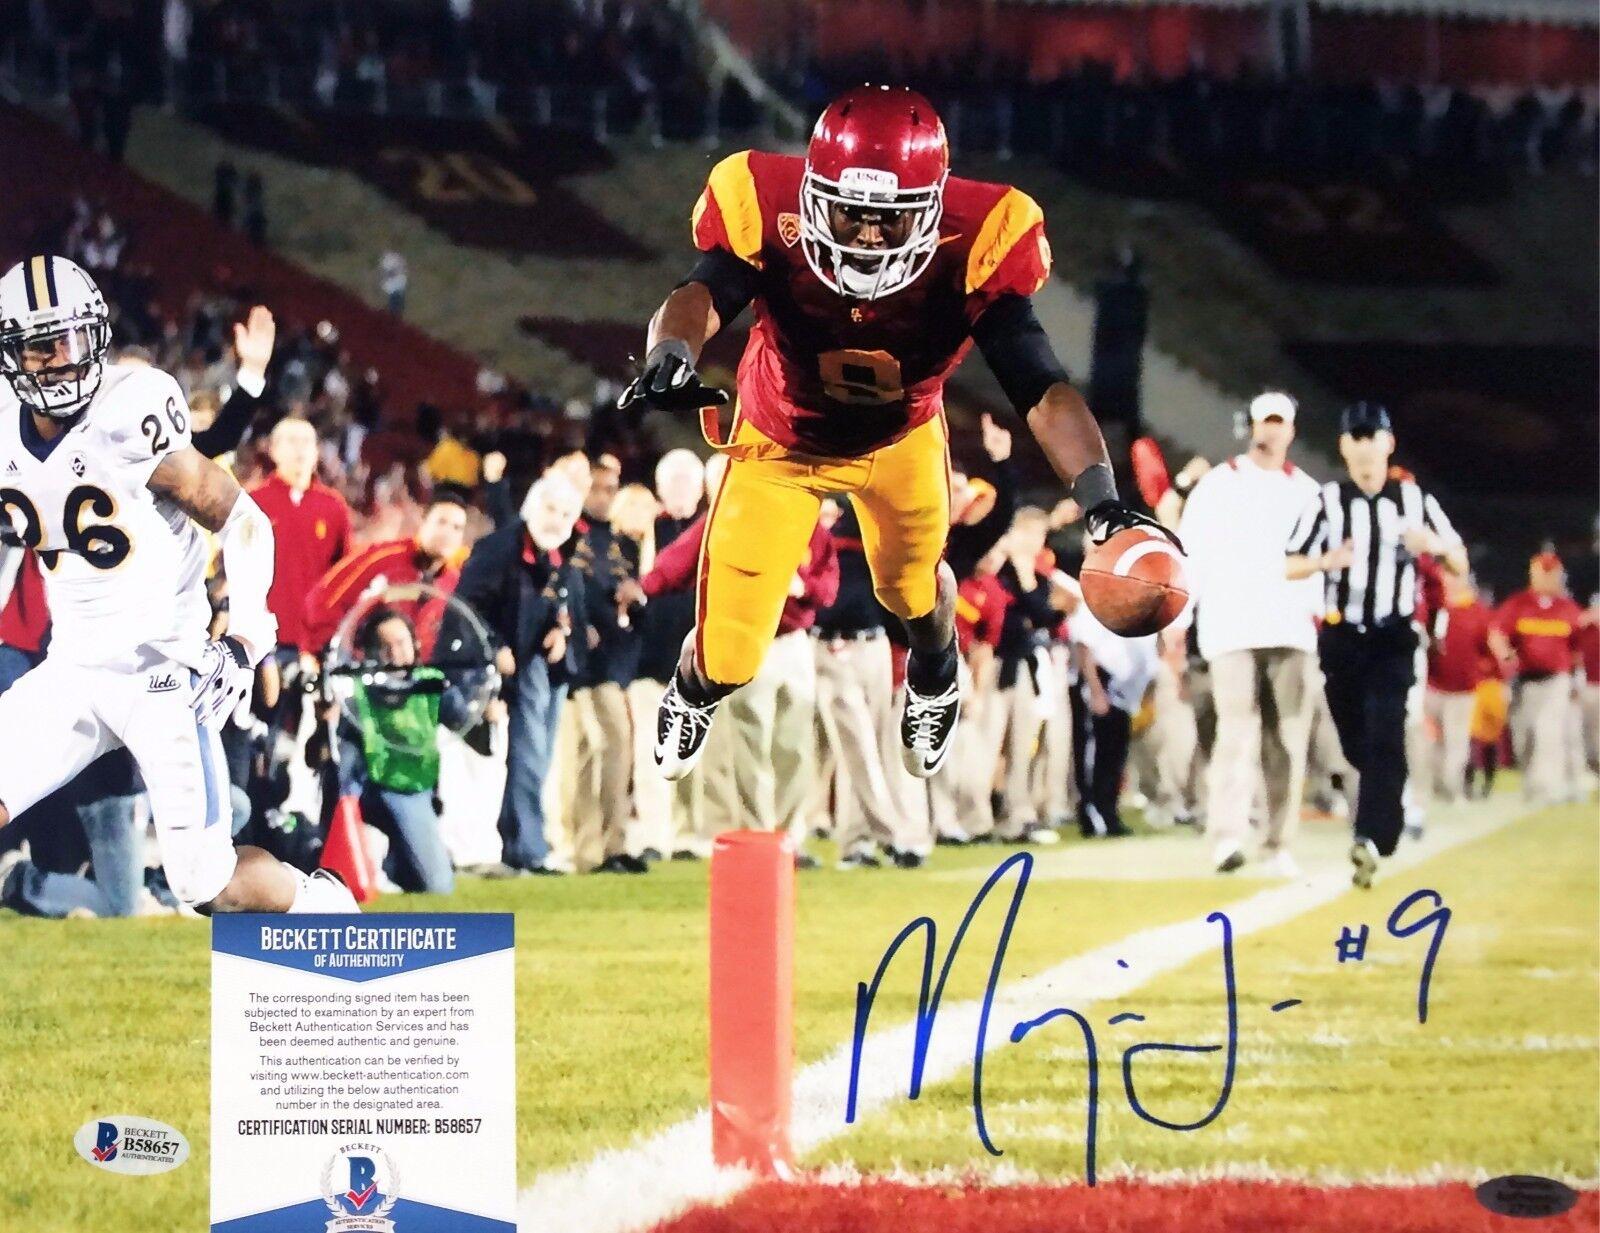 USC Jacksonville Jaguars Marqise Lee Signed 11x14 photo BAS Cert # B 58657